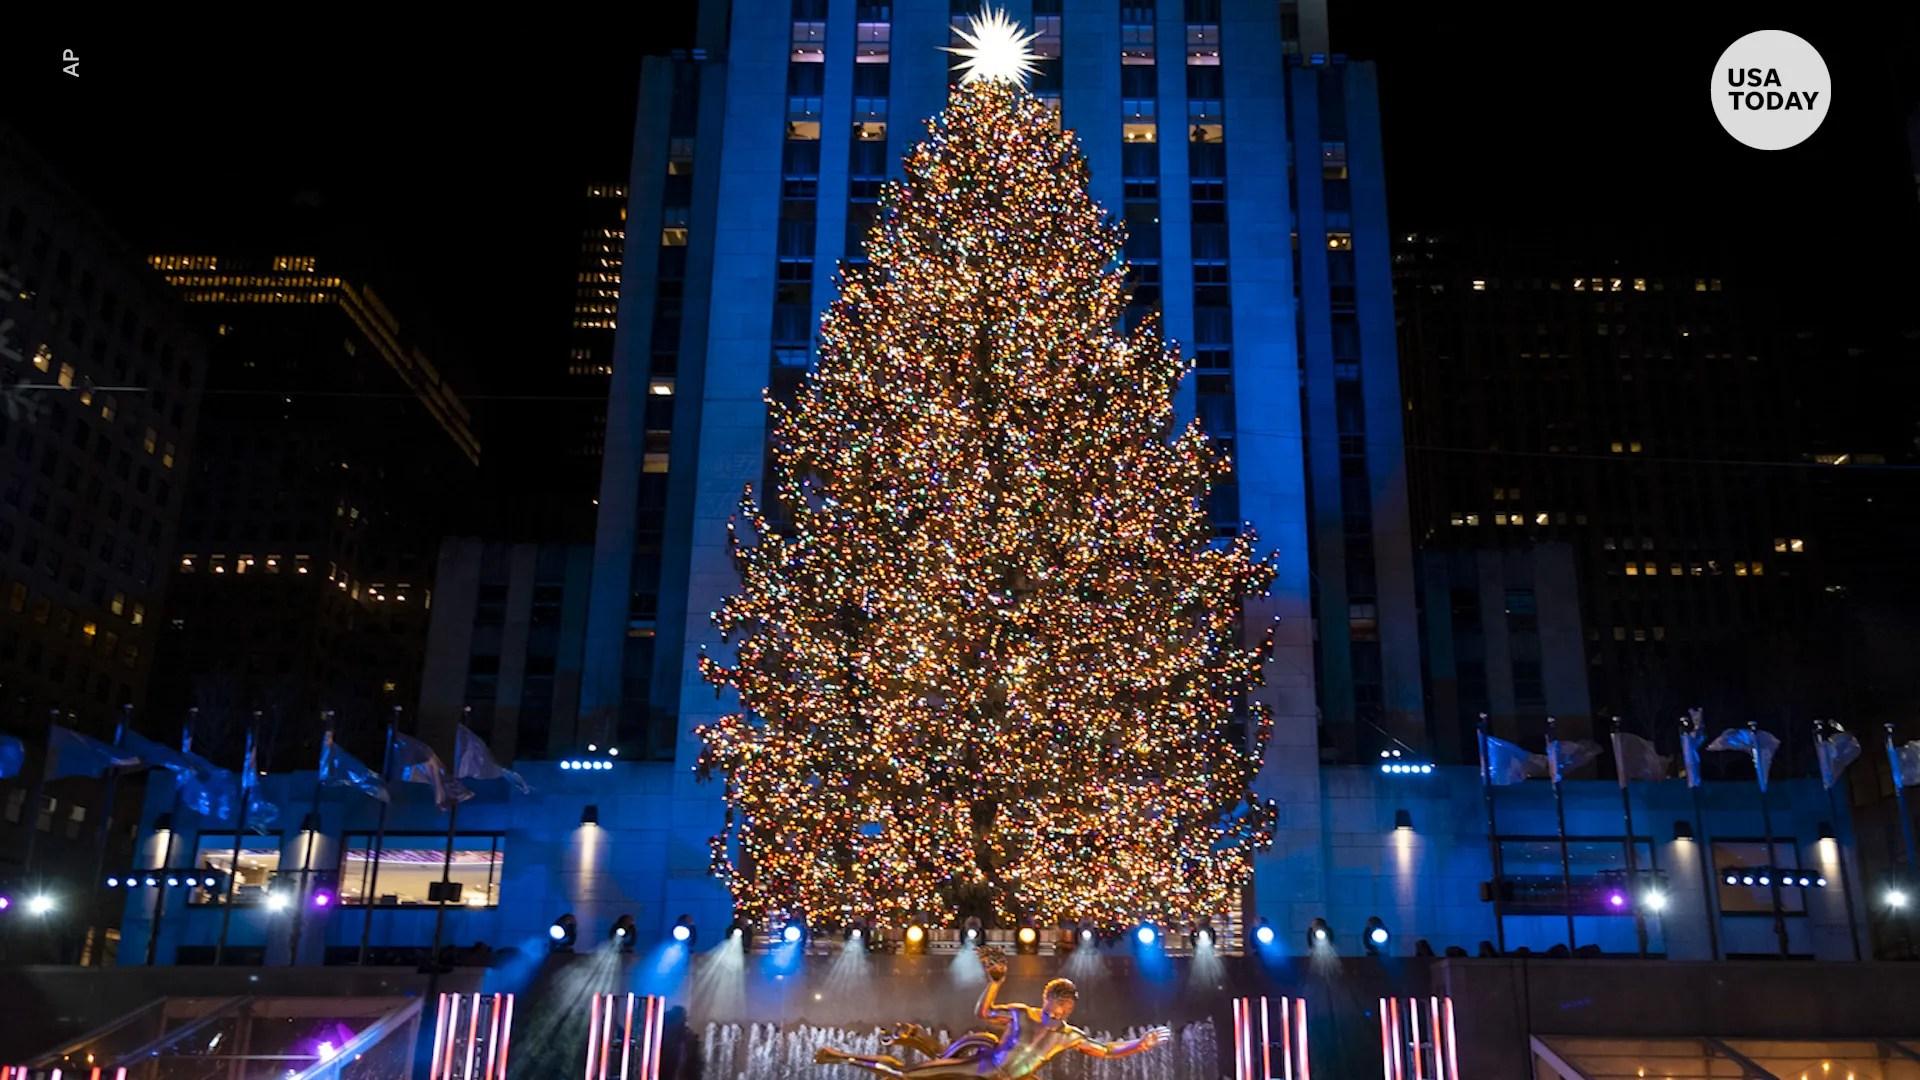 rockefeller center christmas tree dazzles at lighting ceremony